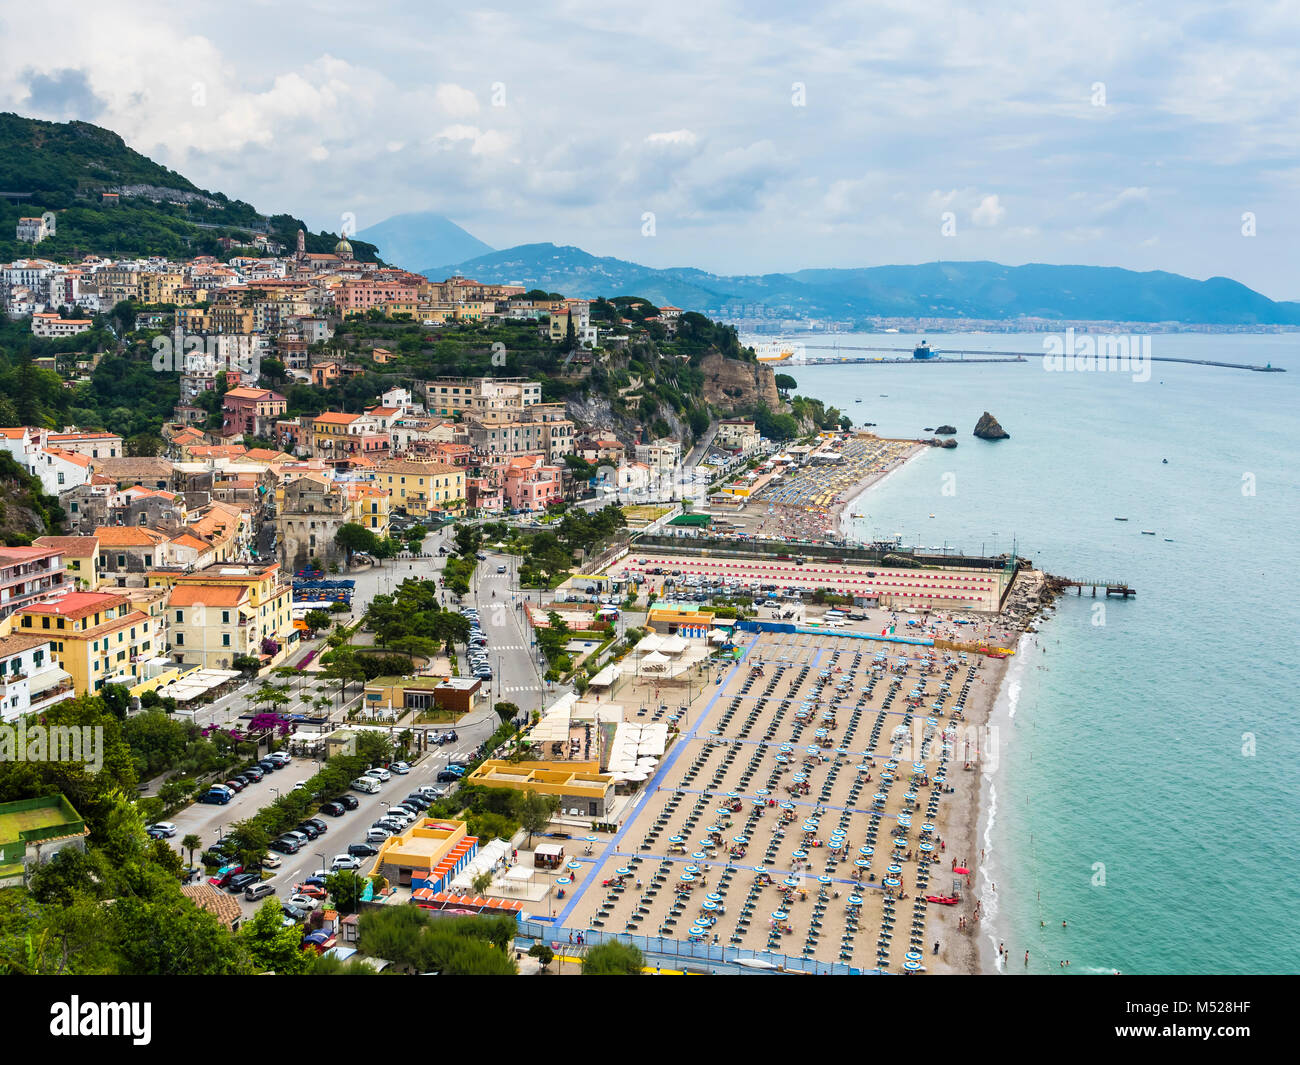 Tourist lido with umbrellas and sunbeds,Vietri sul Mare,province of Salerno,Amalfi Coast,Campania,Italy Stock Photo